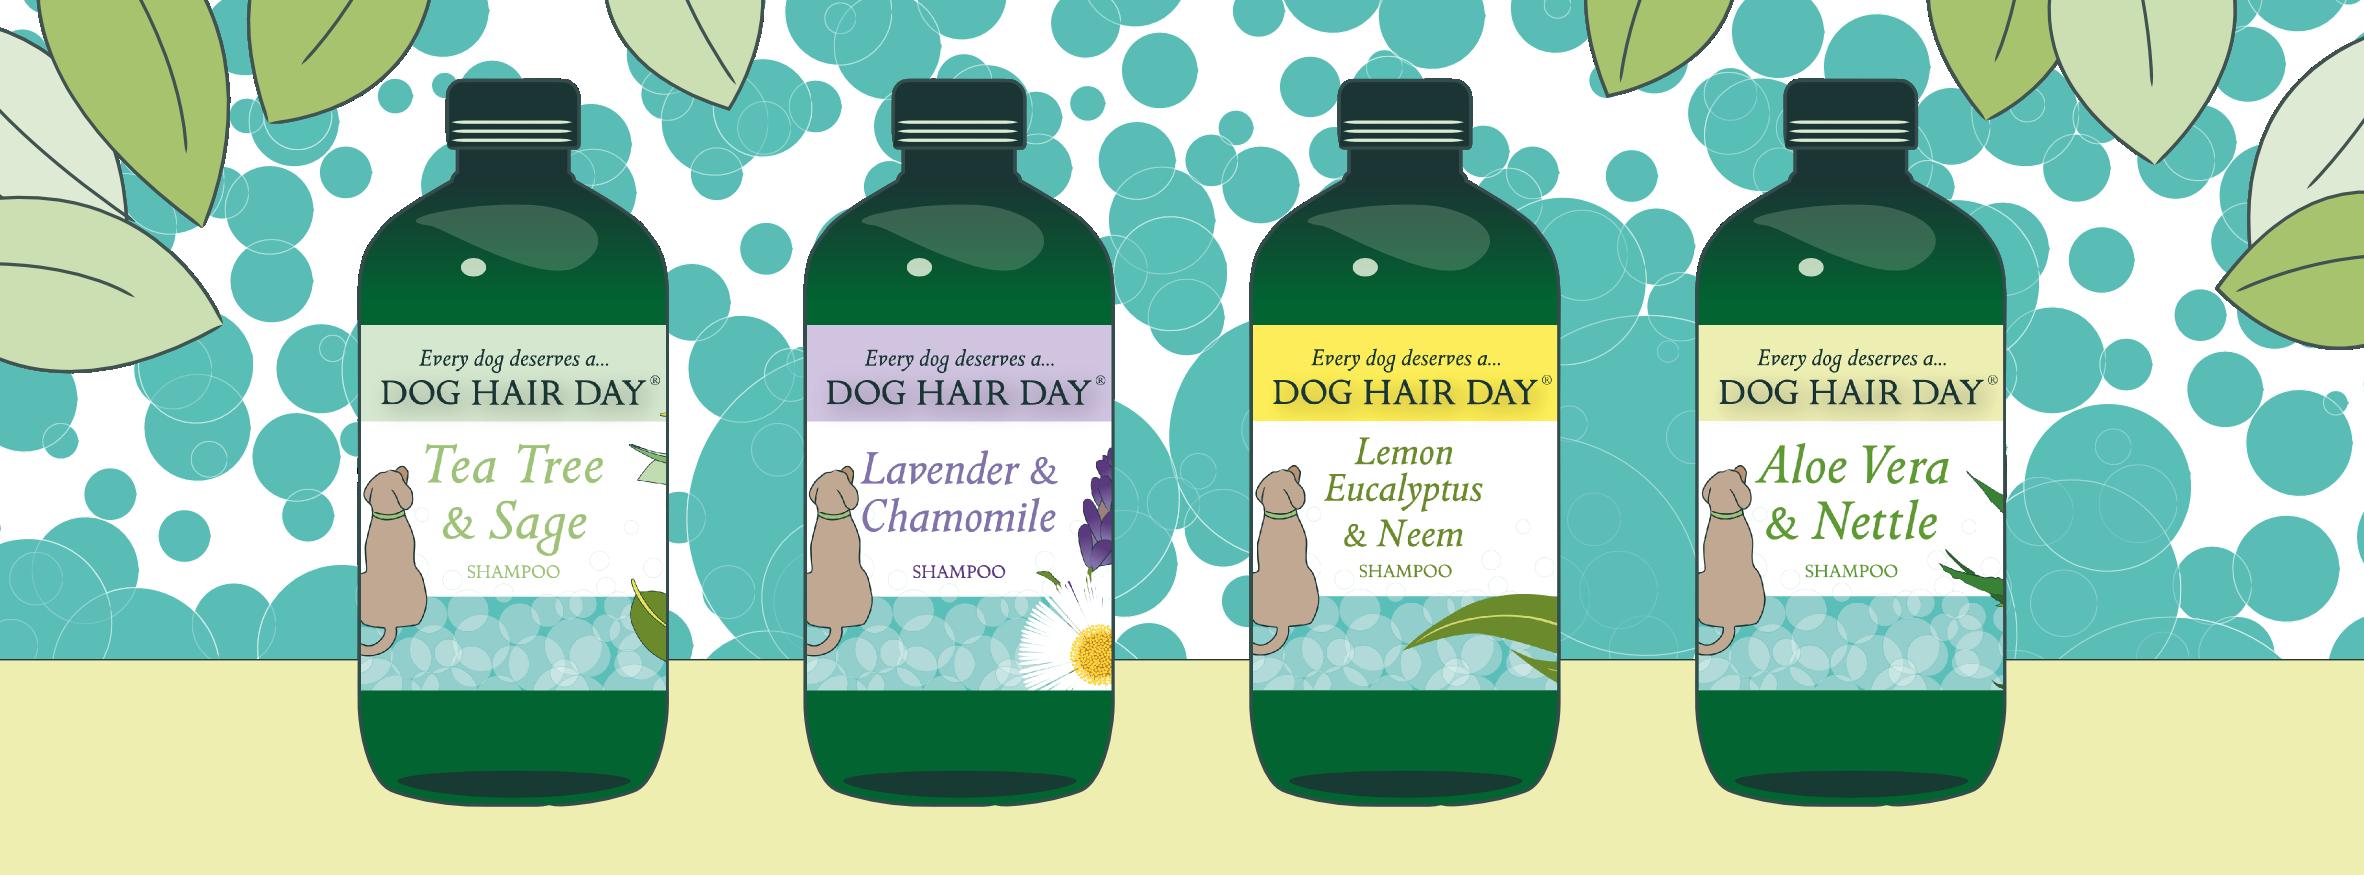 Aloe Vera & Nettle, Lavender & Chamomile, Tea Tree & Sage Dog Hair Day shampoos